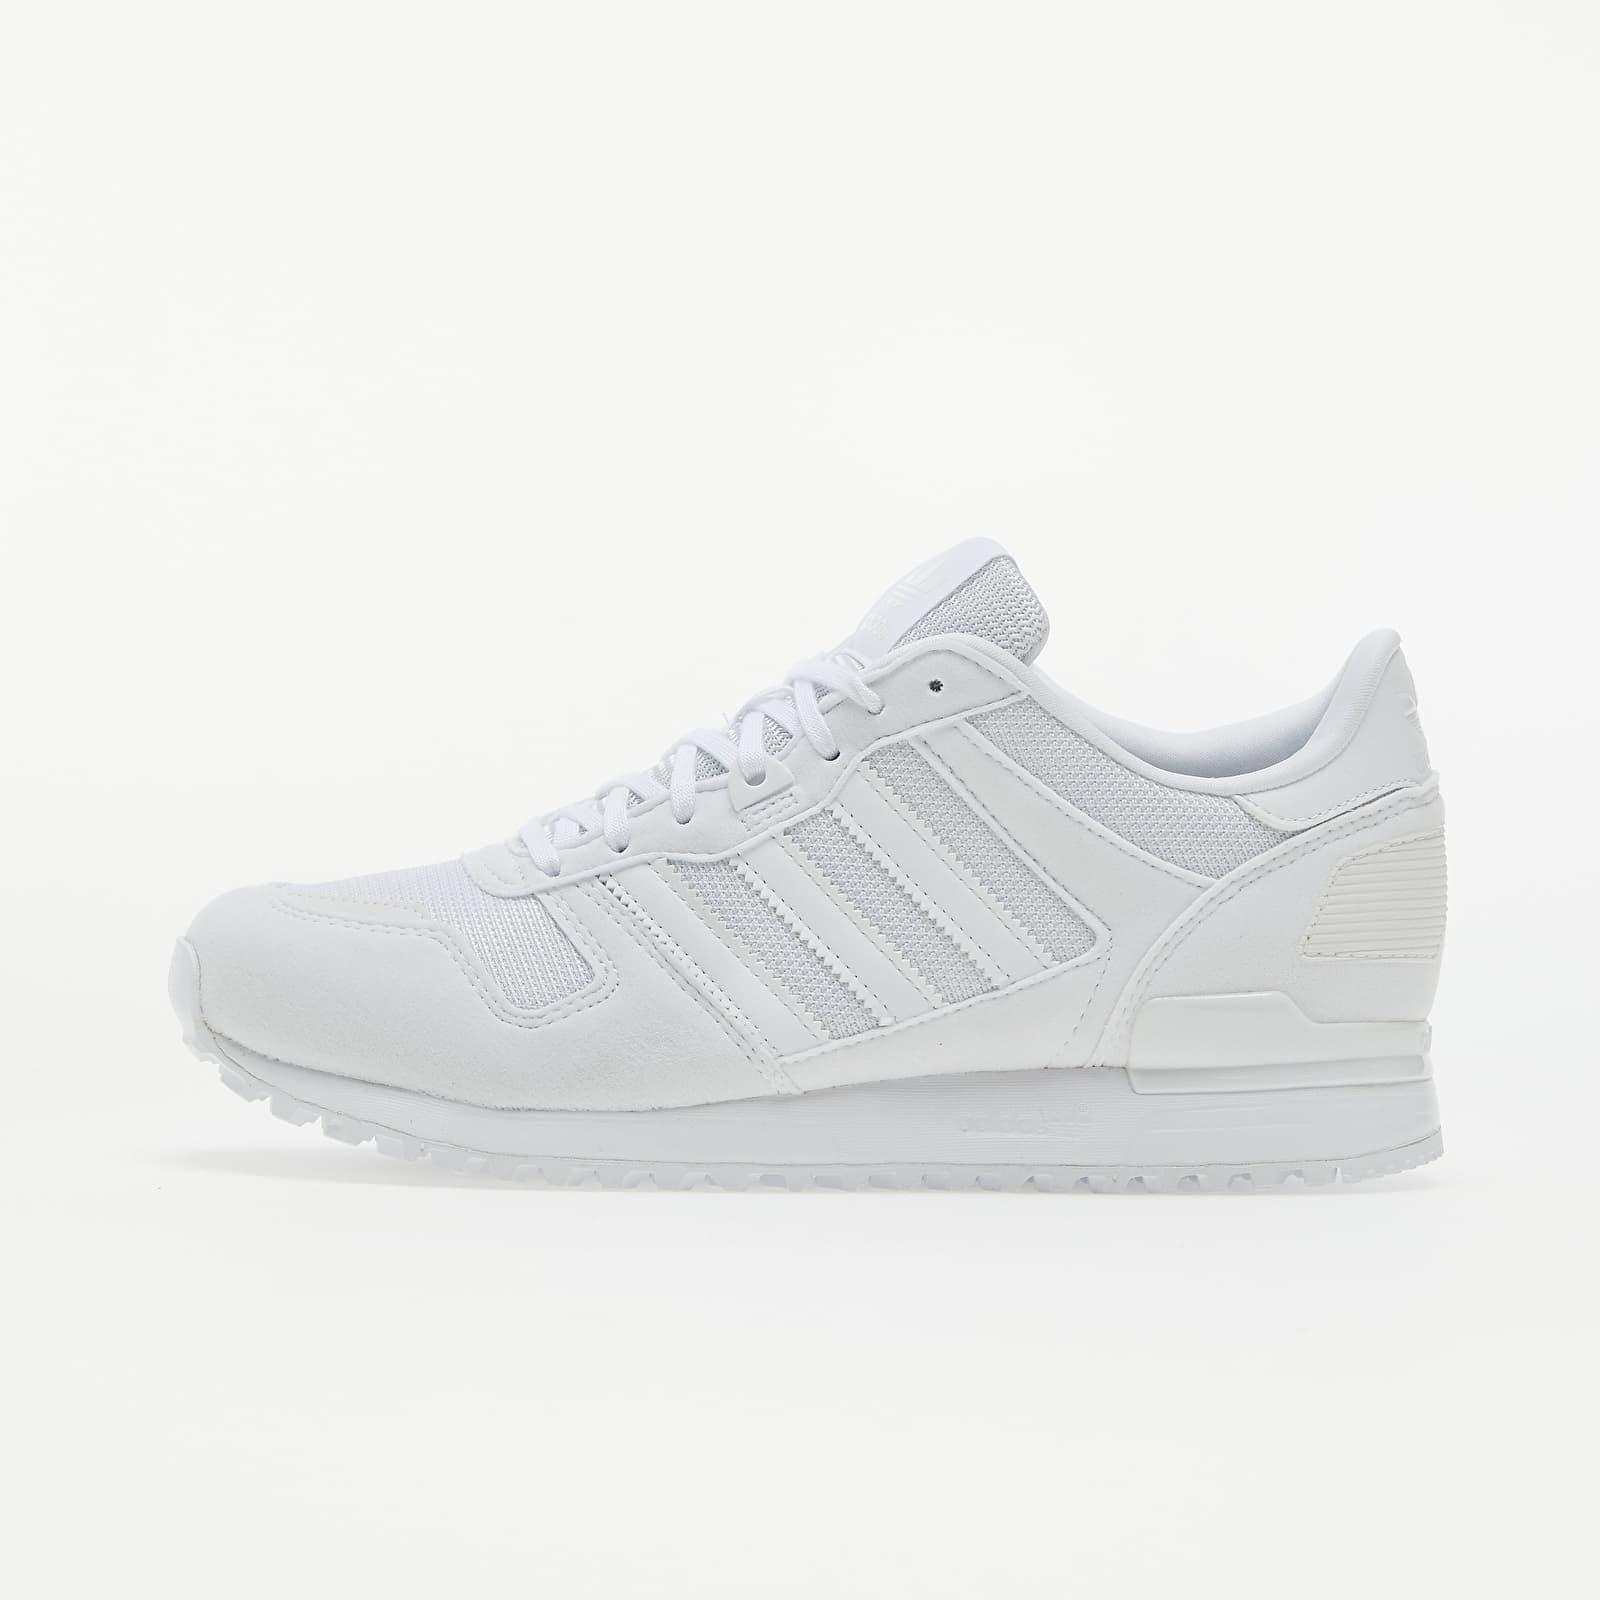 adidas ZX 700 Ftwr White/ Ftwr White/ Ftwr White EUR 43 1/3